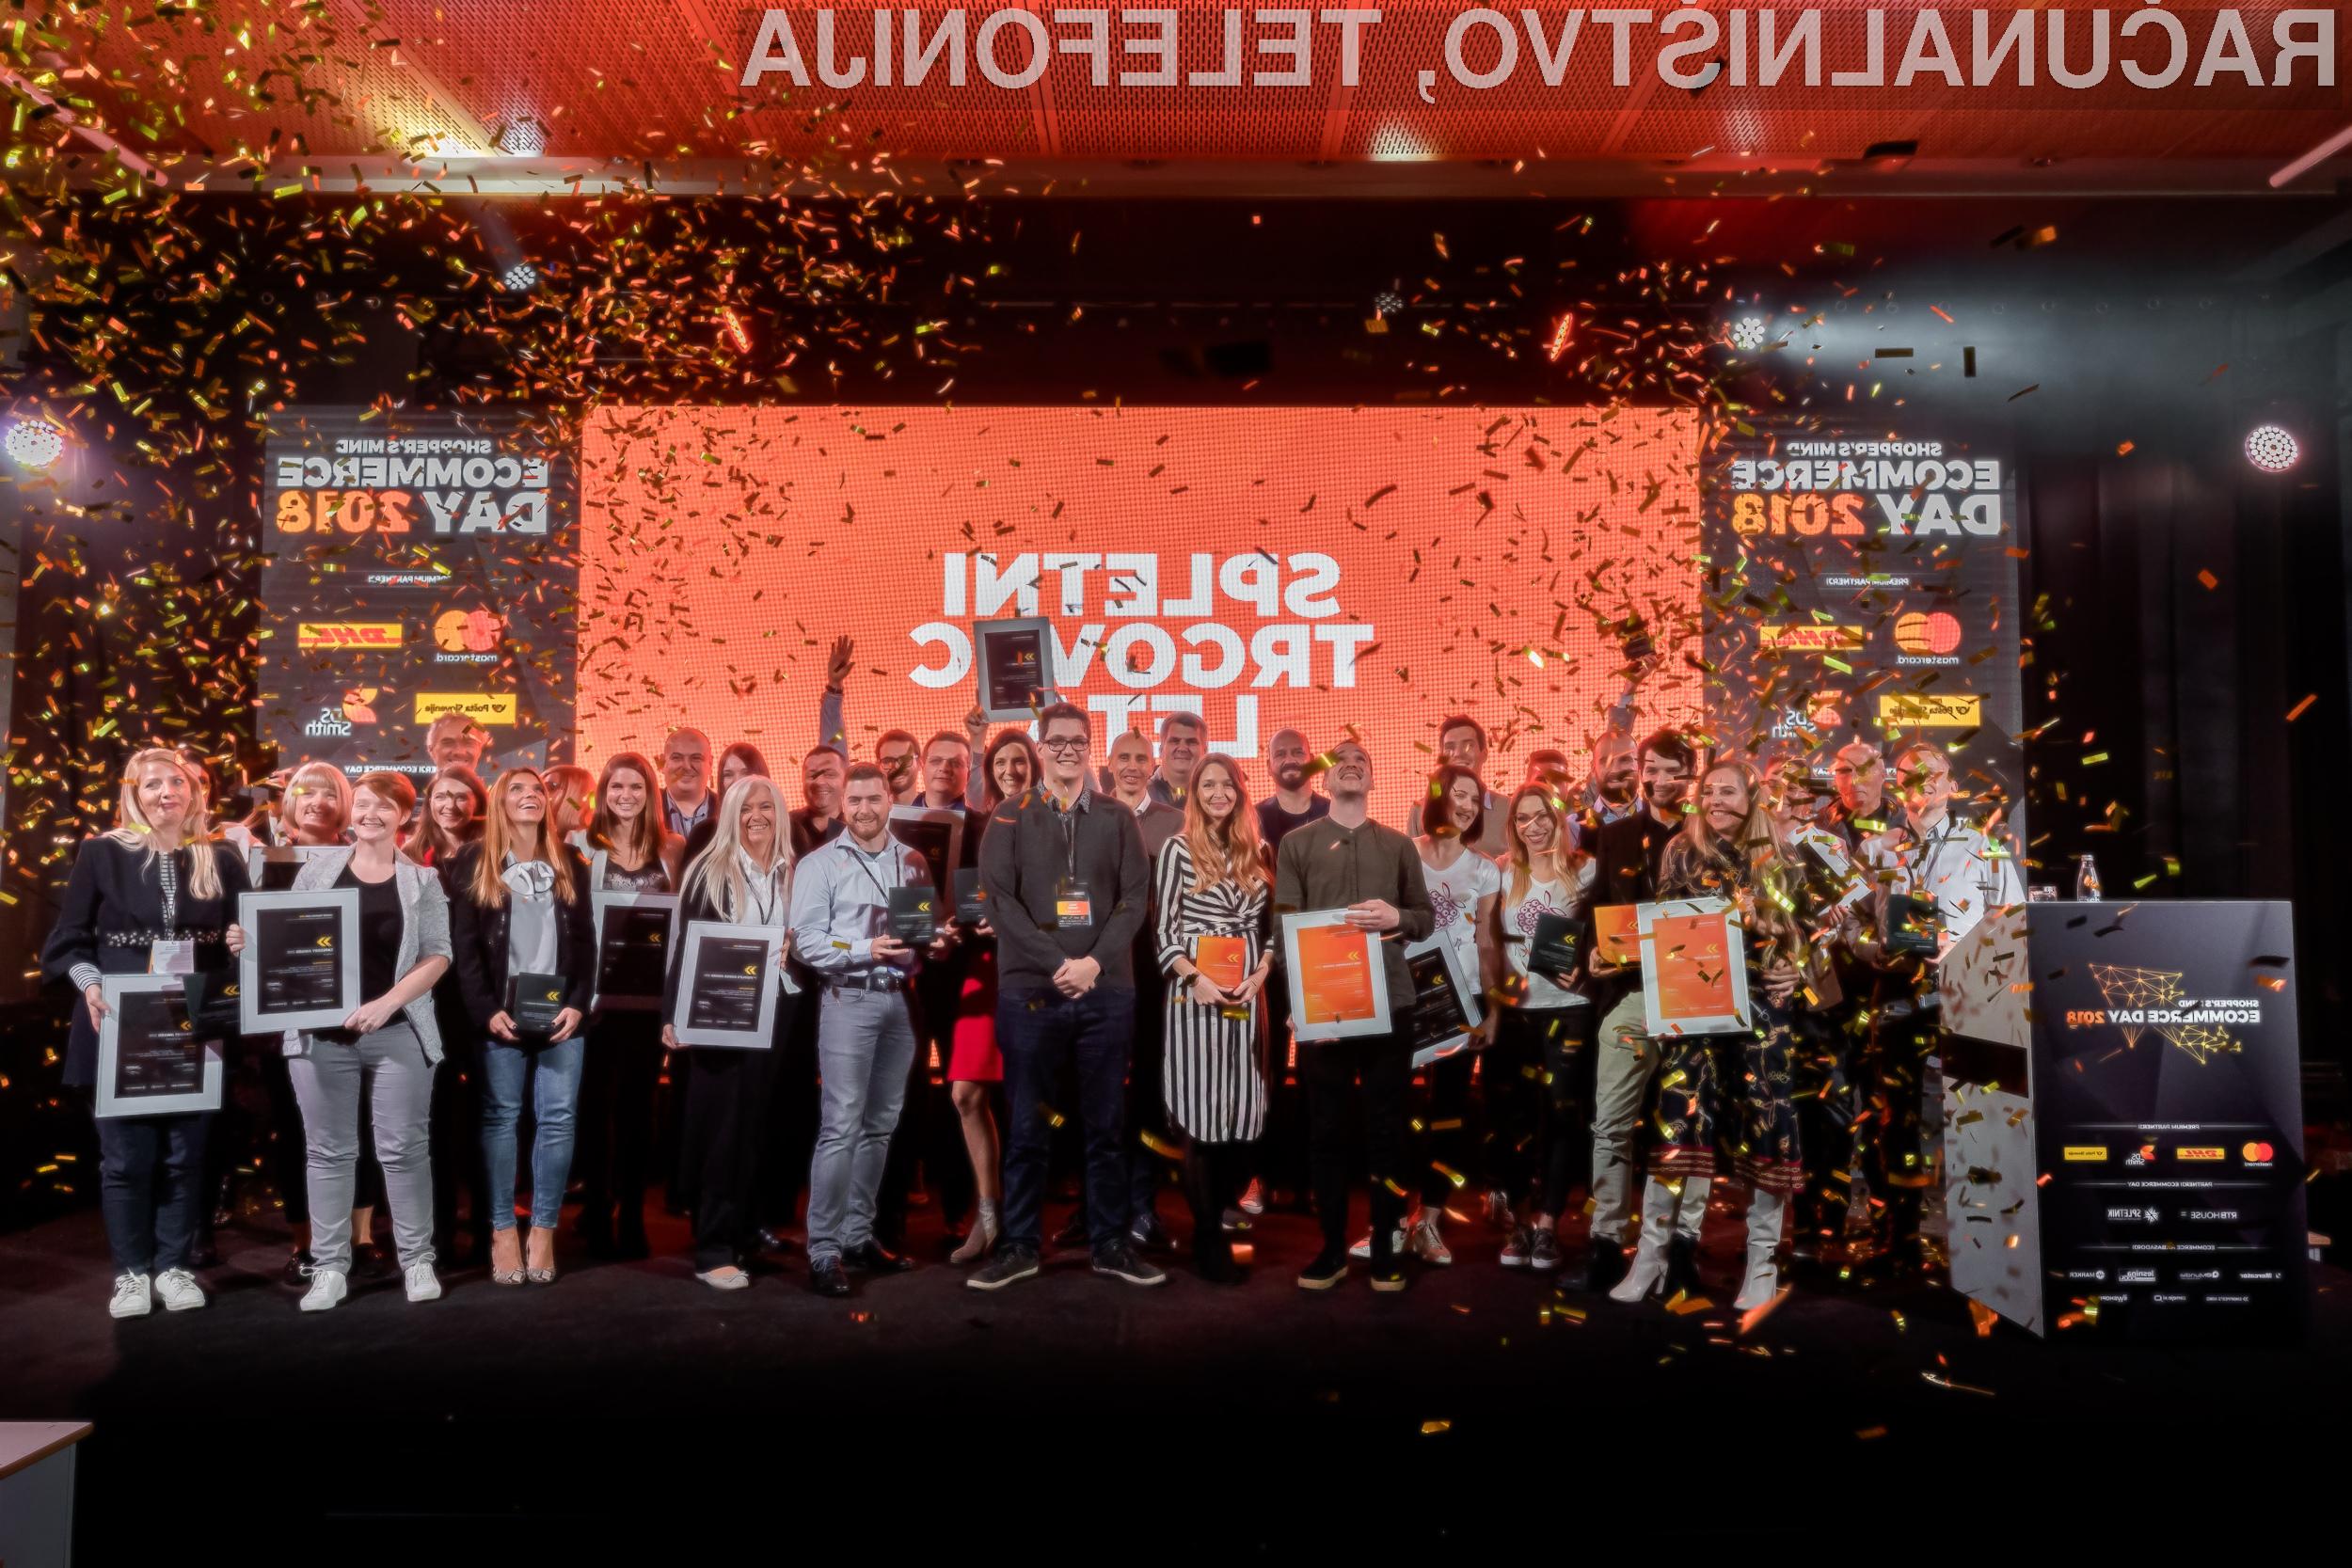 Winners of the Online Splitter of the Year in 2018.